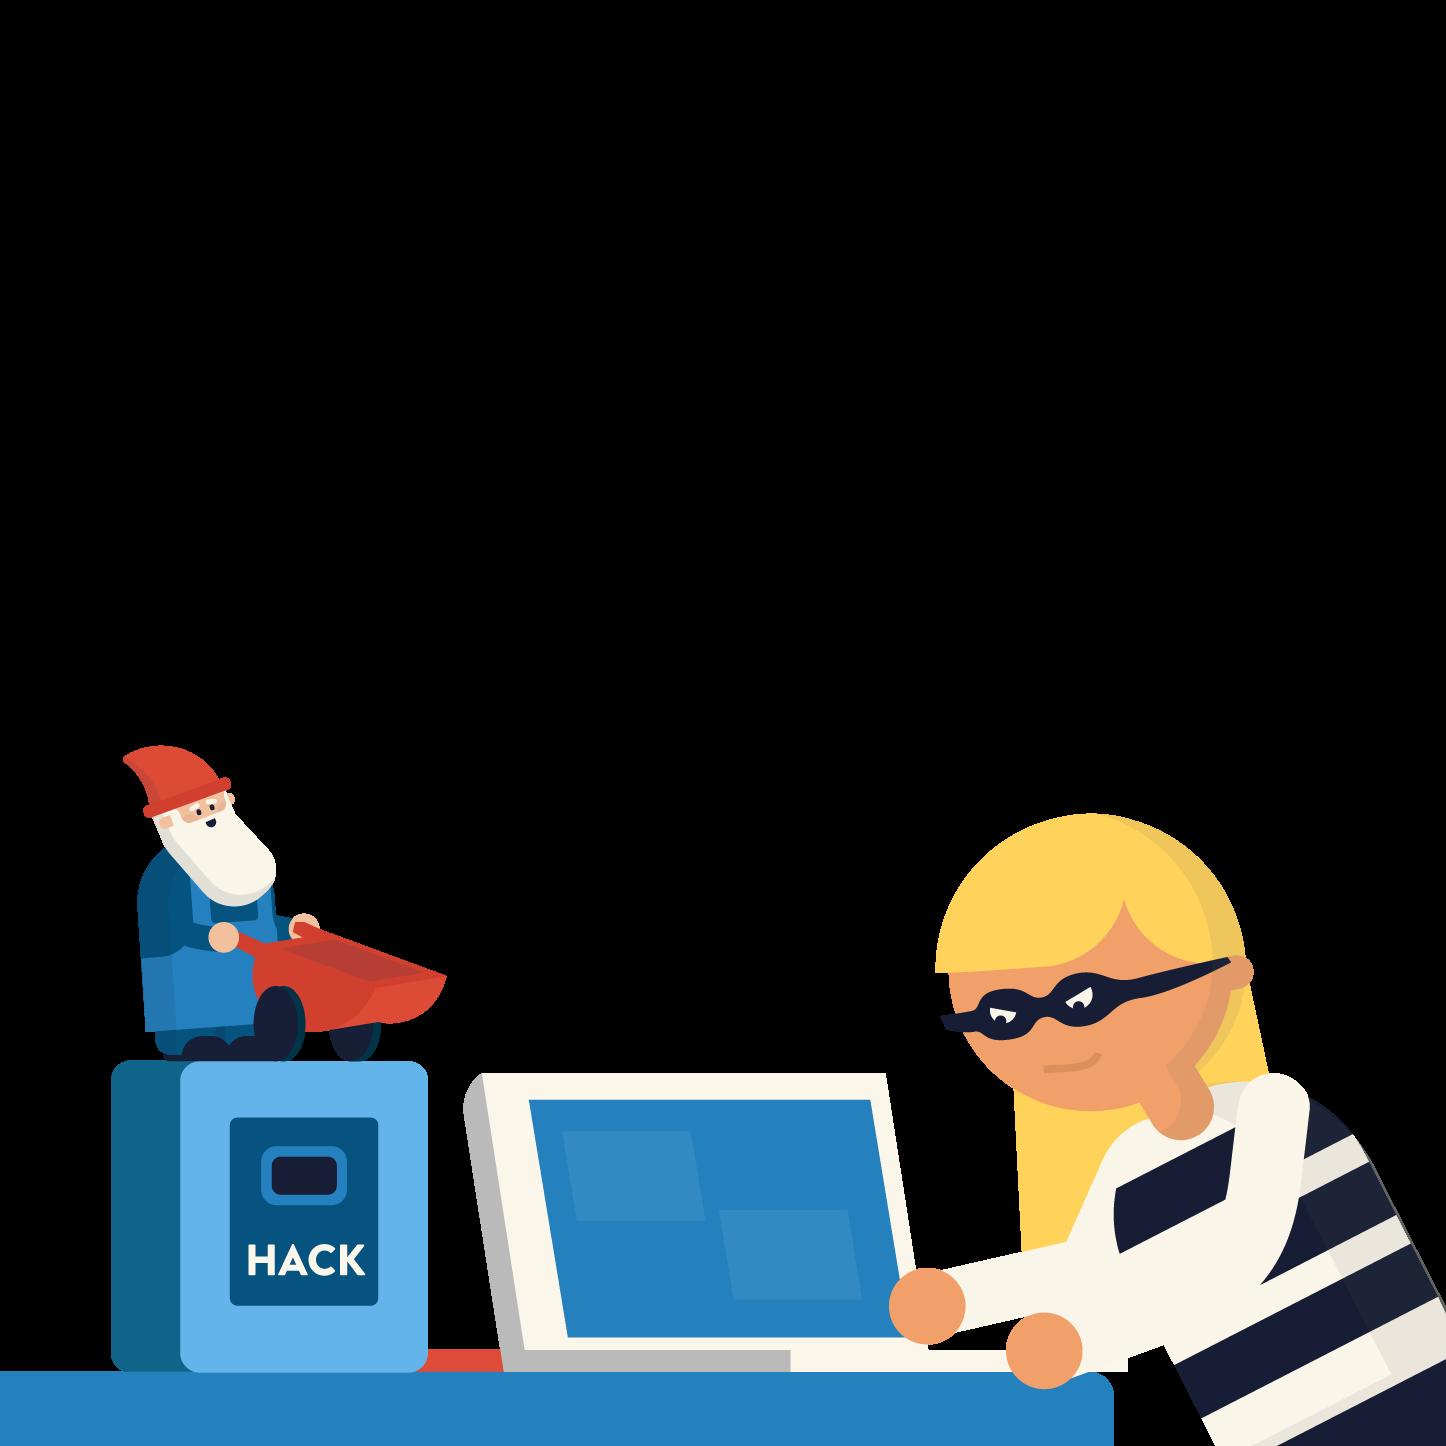 thief hacking into a shop computer